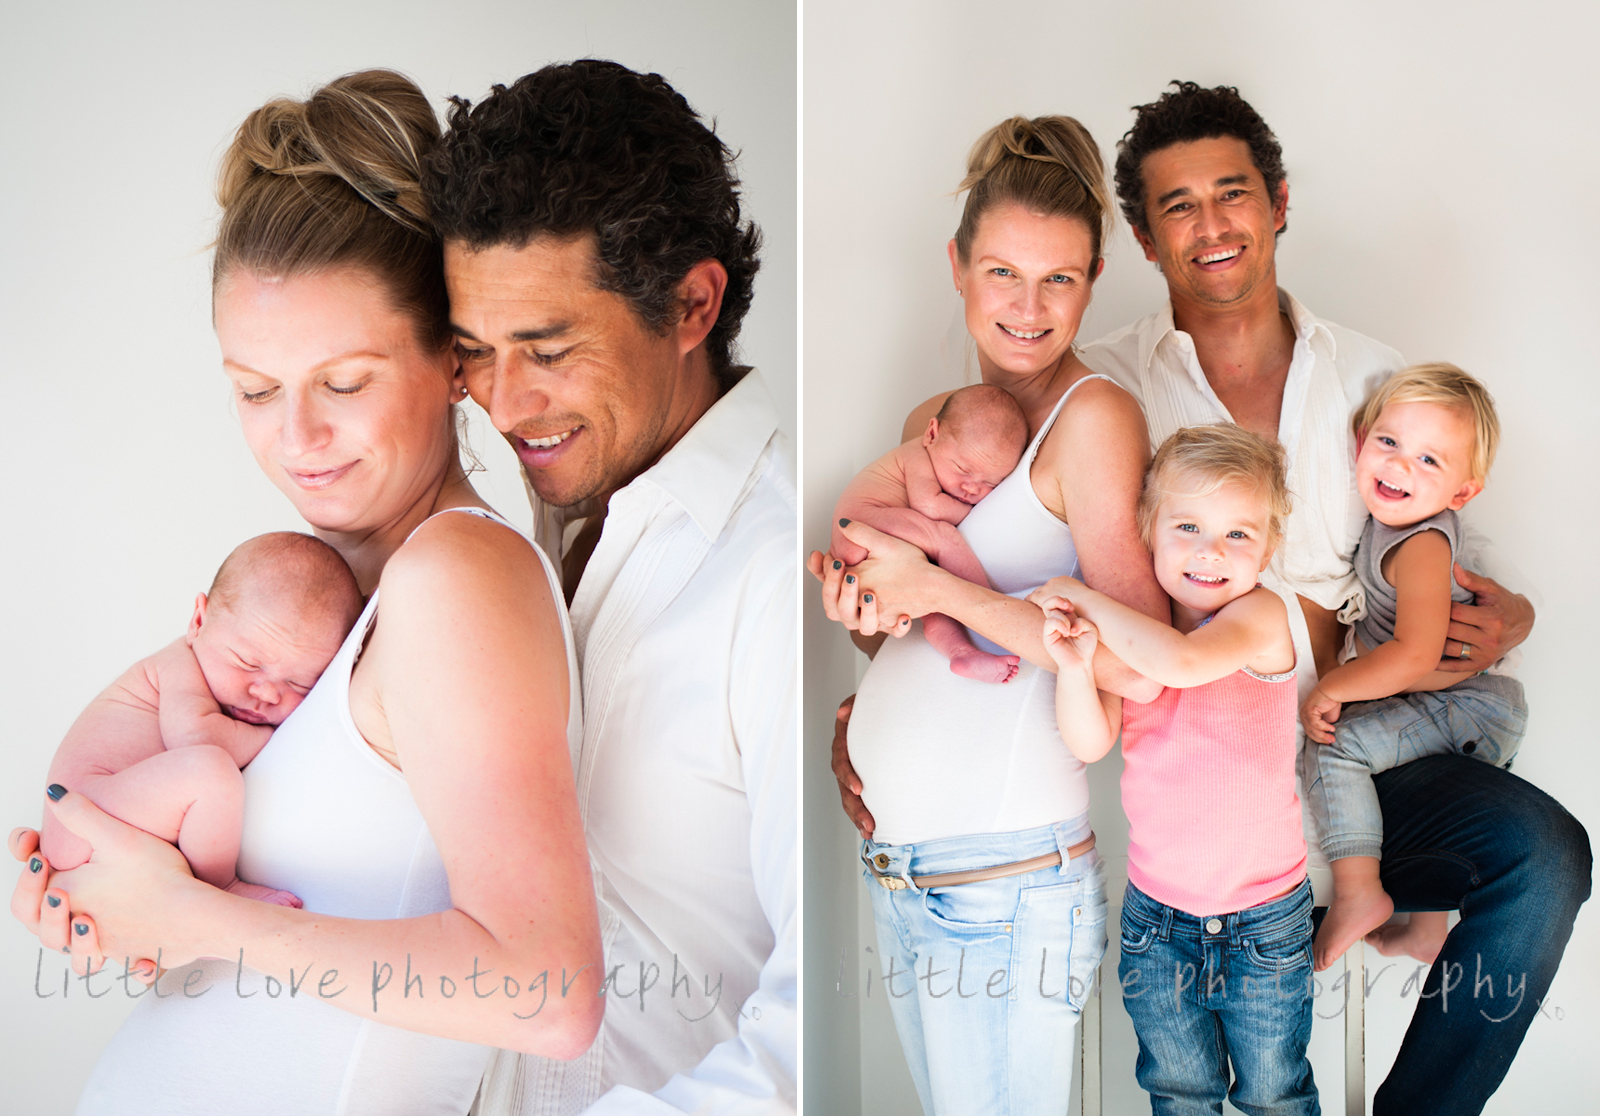 beautiful-image-of-sleepy-newborn-photos-of-baby-with-family-photography-sydney